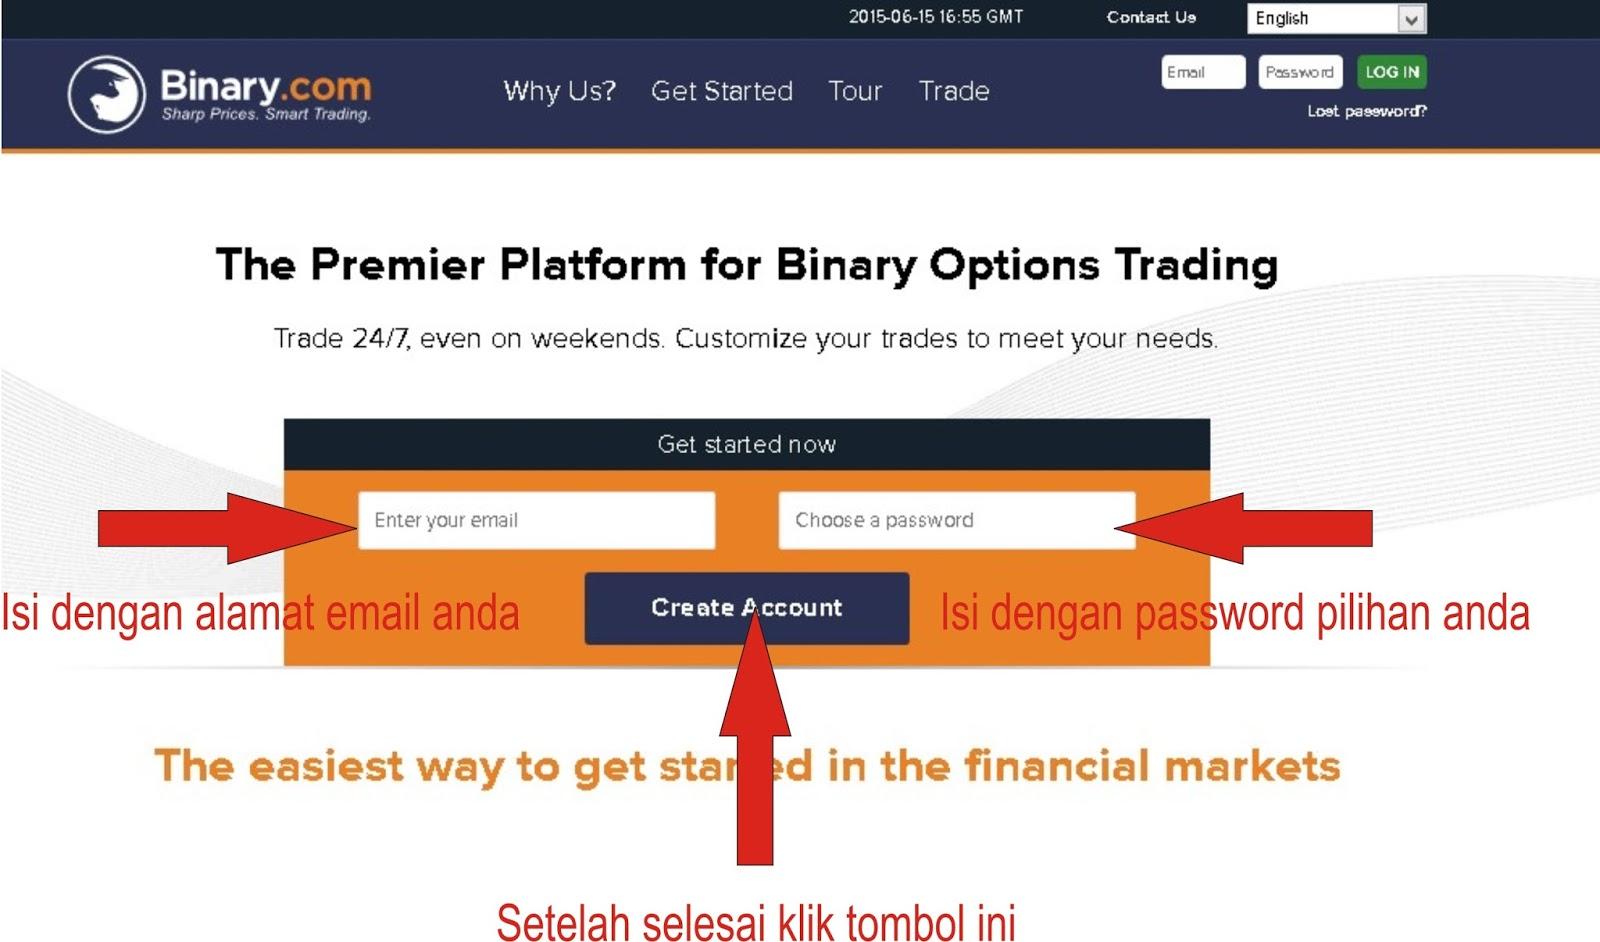 Anfanger broker binare optionen fur